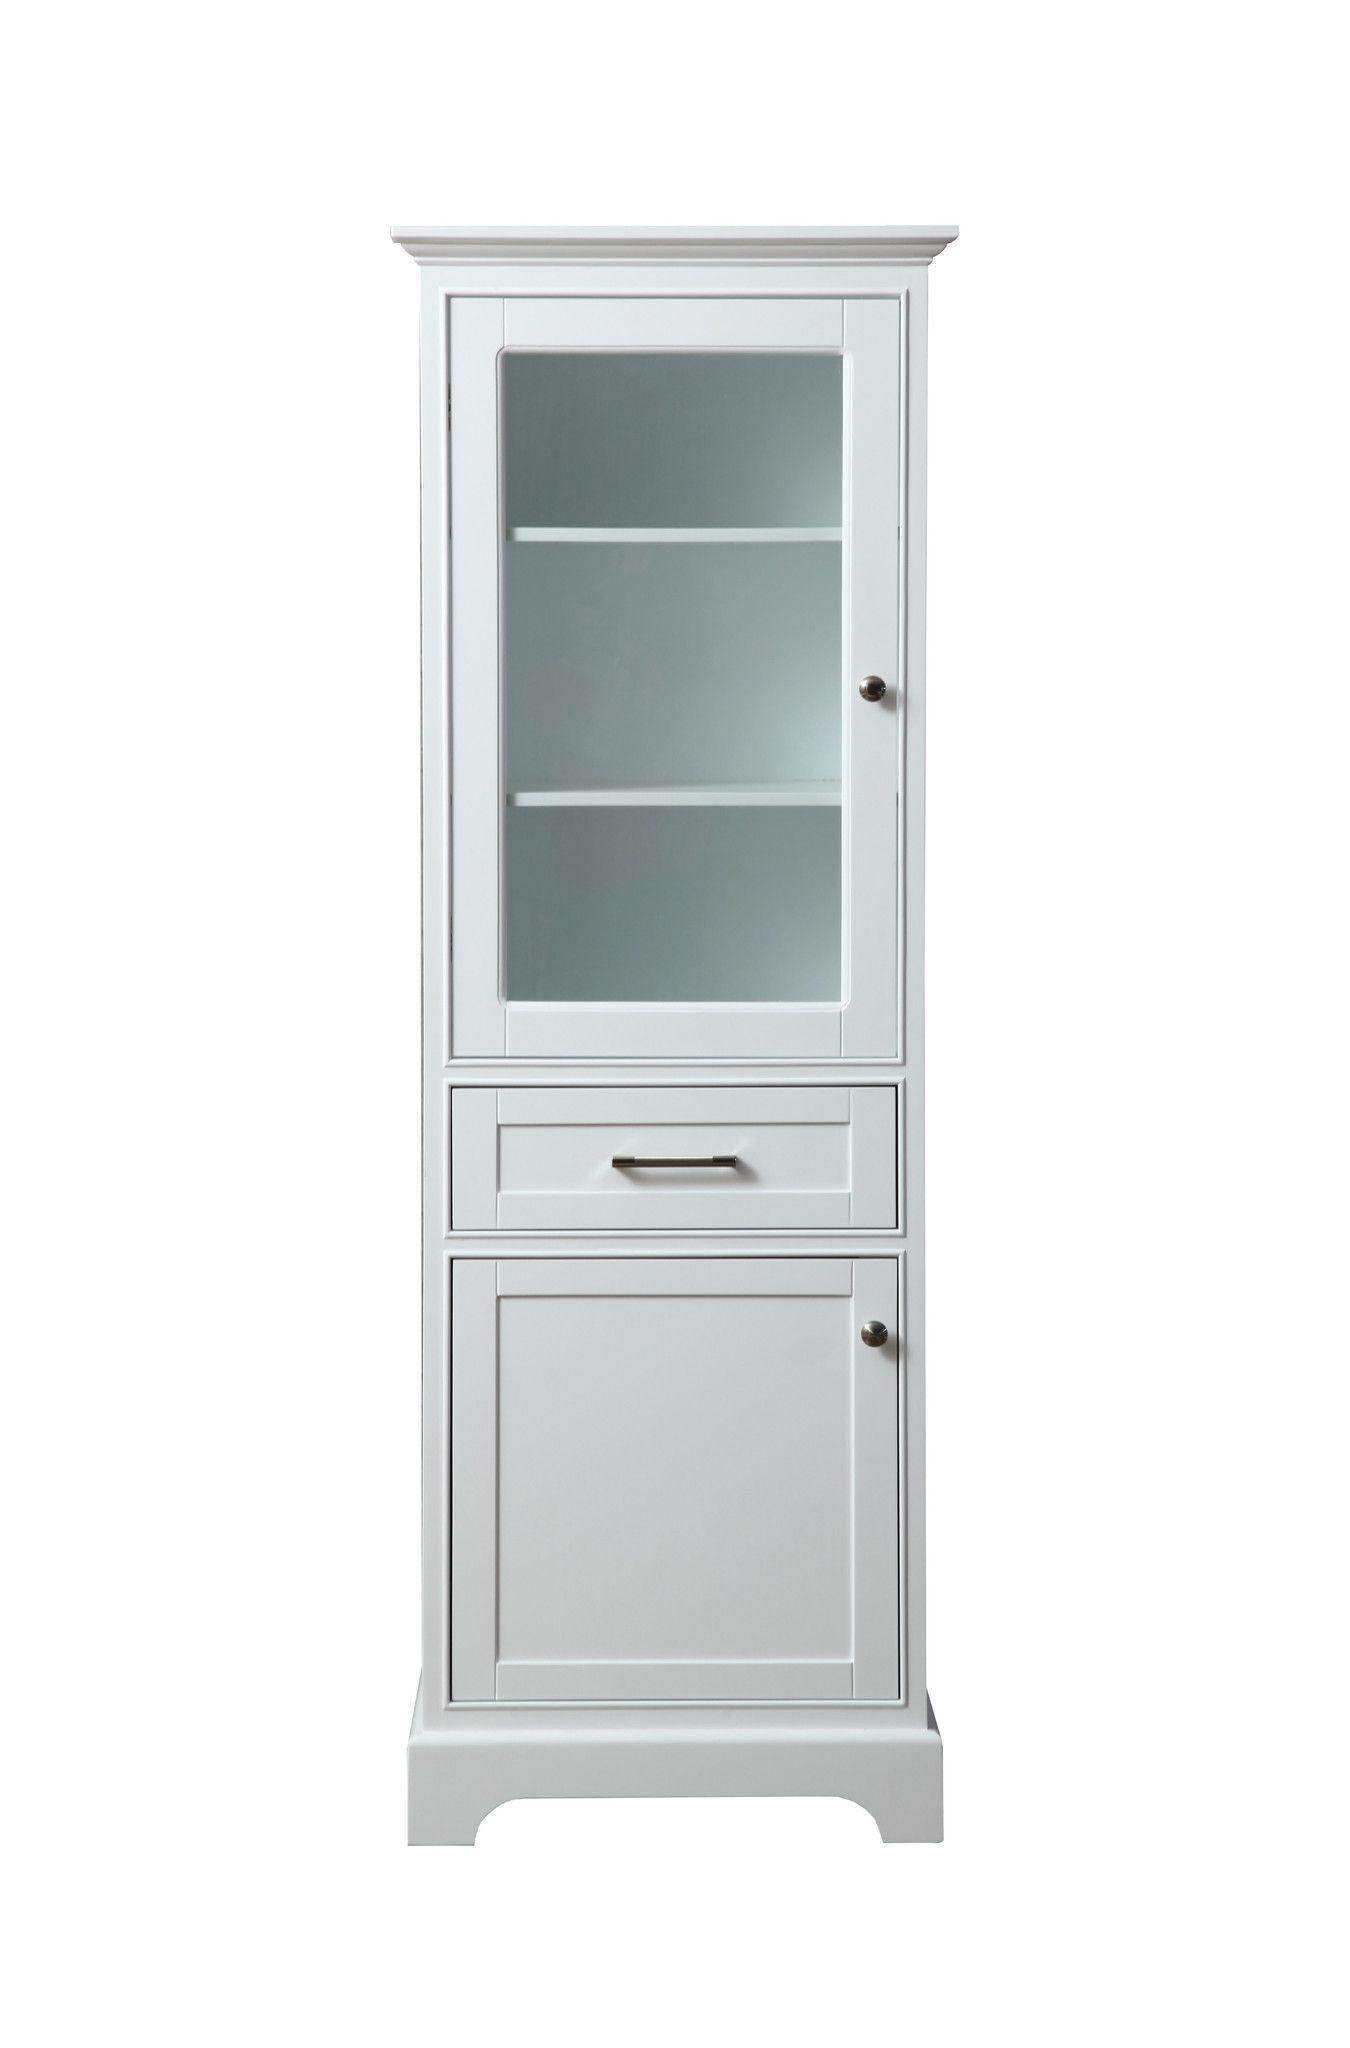 Morgan 24 Inch Linen Cabinet Cabinet Linen Cabinet Cabinet Shelving